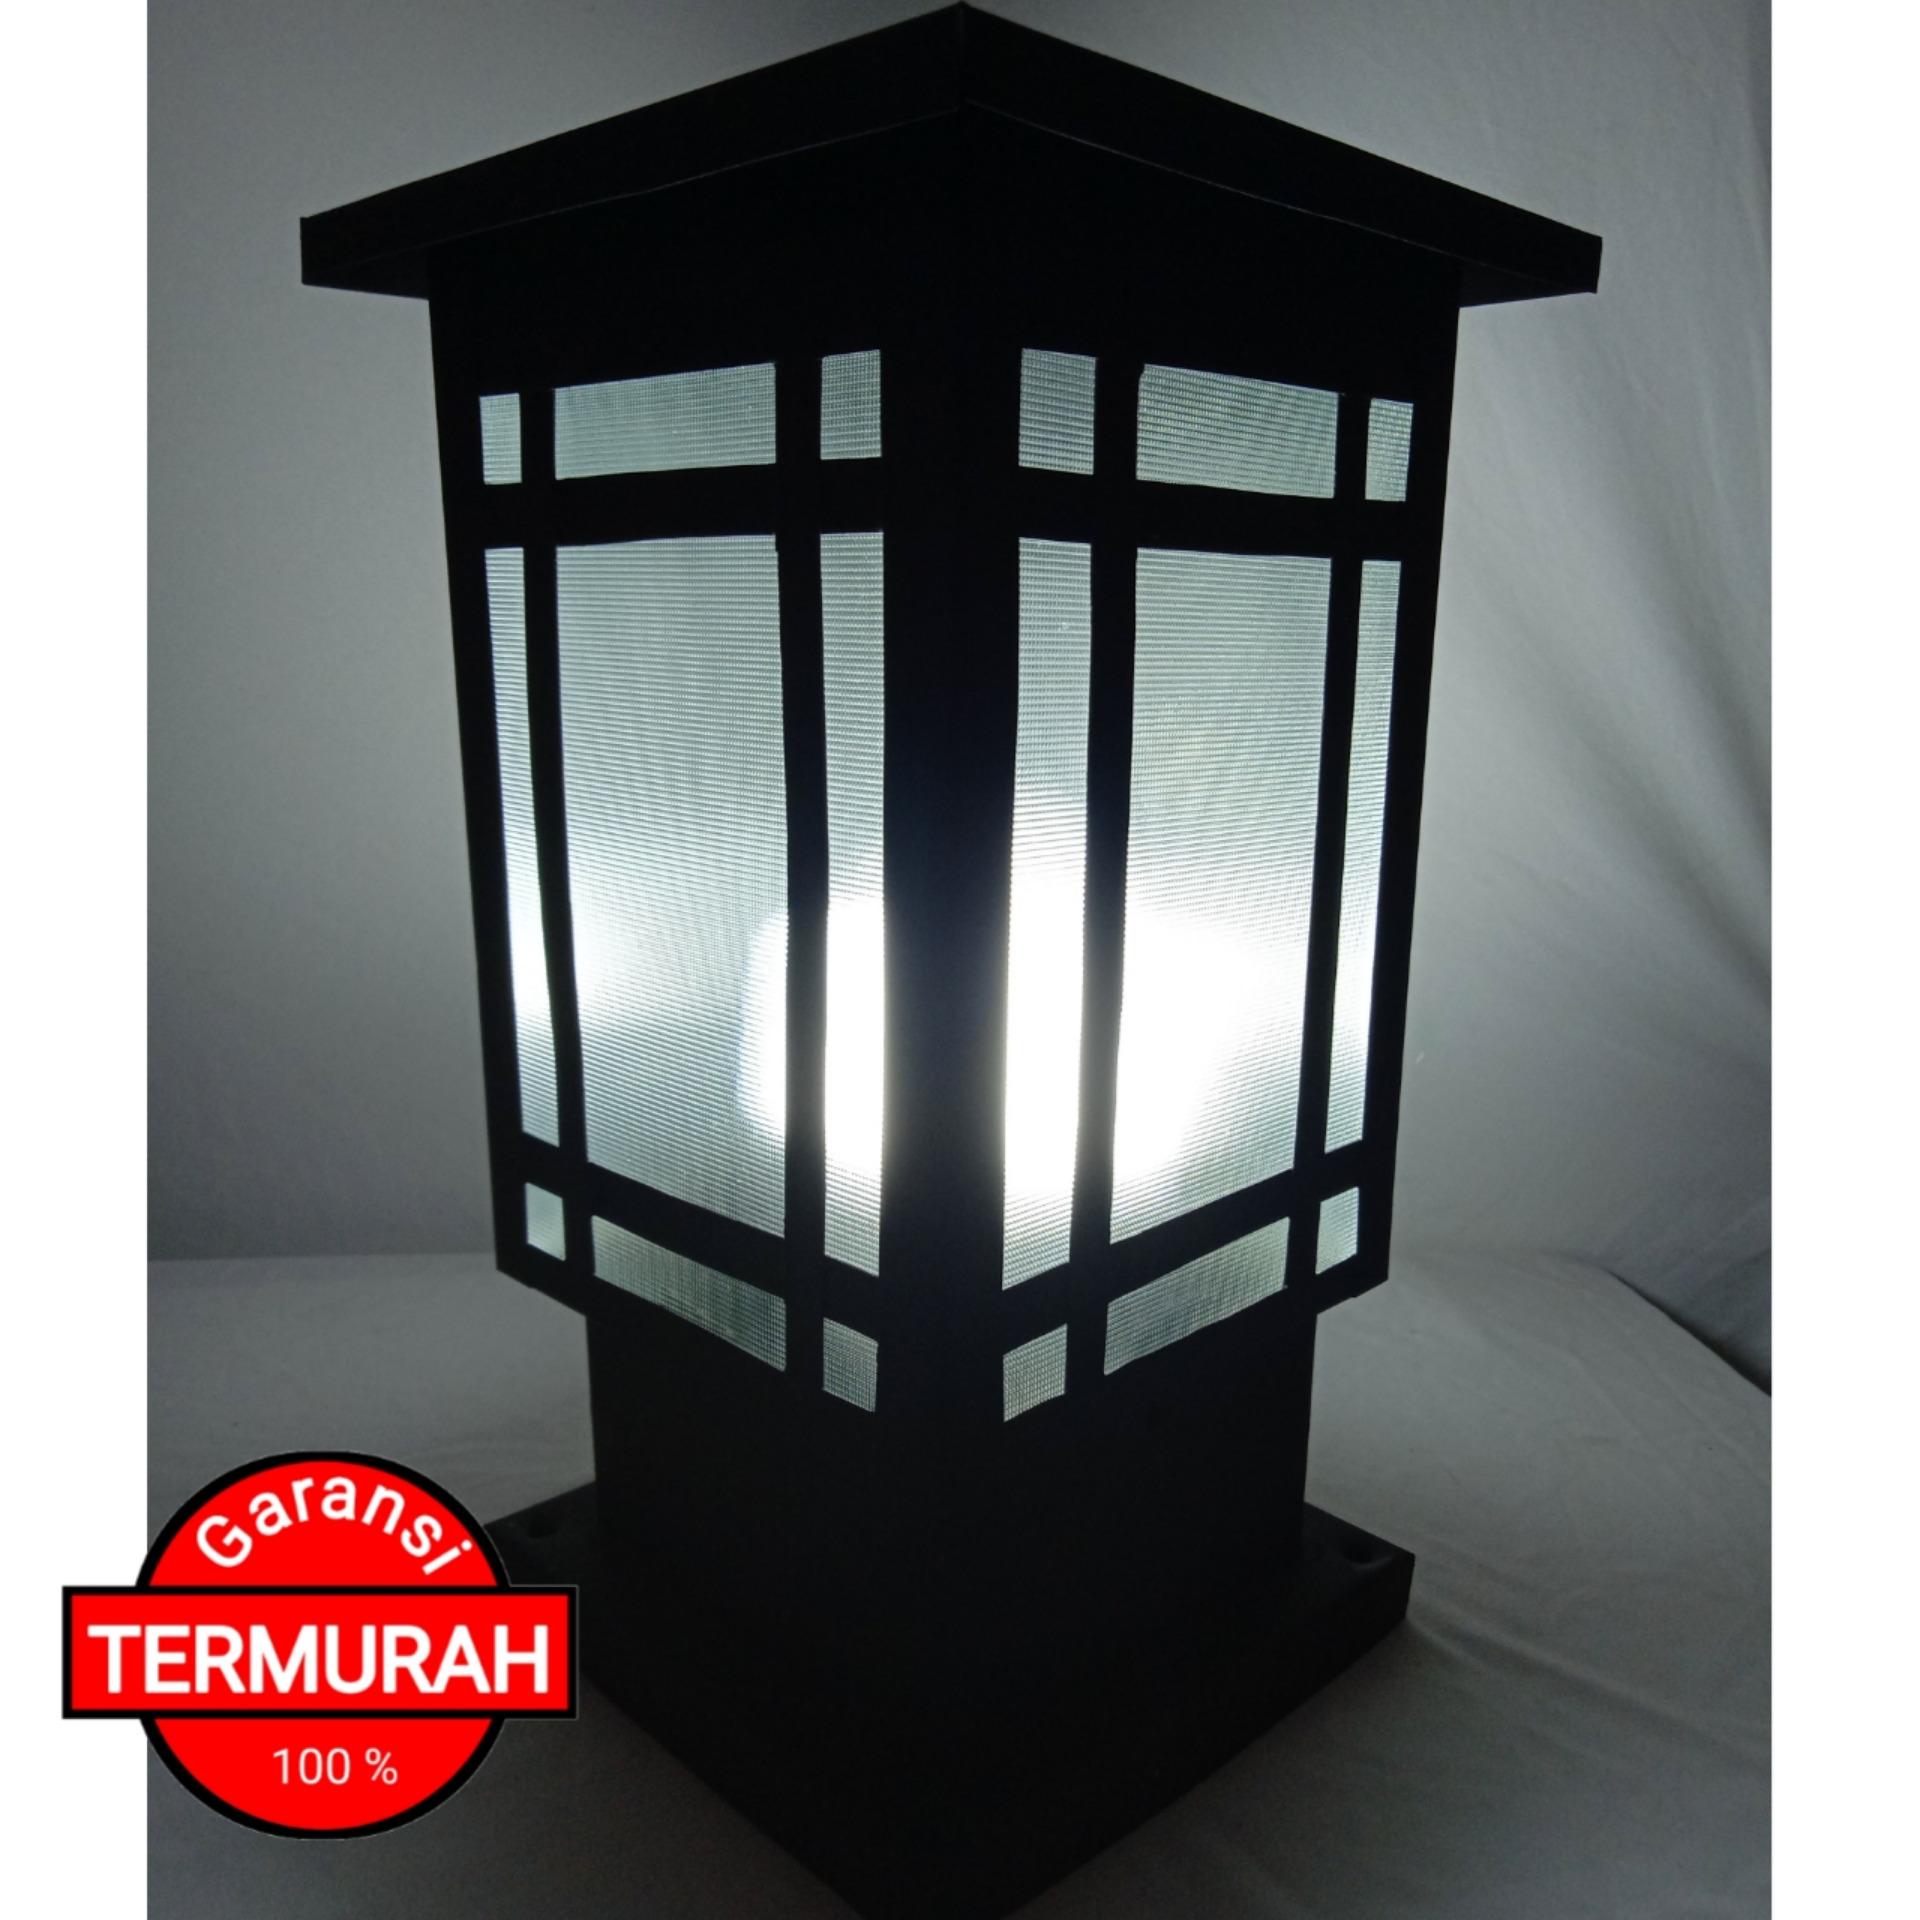 Lampu Hias Minimalis Taman Pilar Pagar Tipe Produk Original Ukm Lazada Indonesia